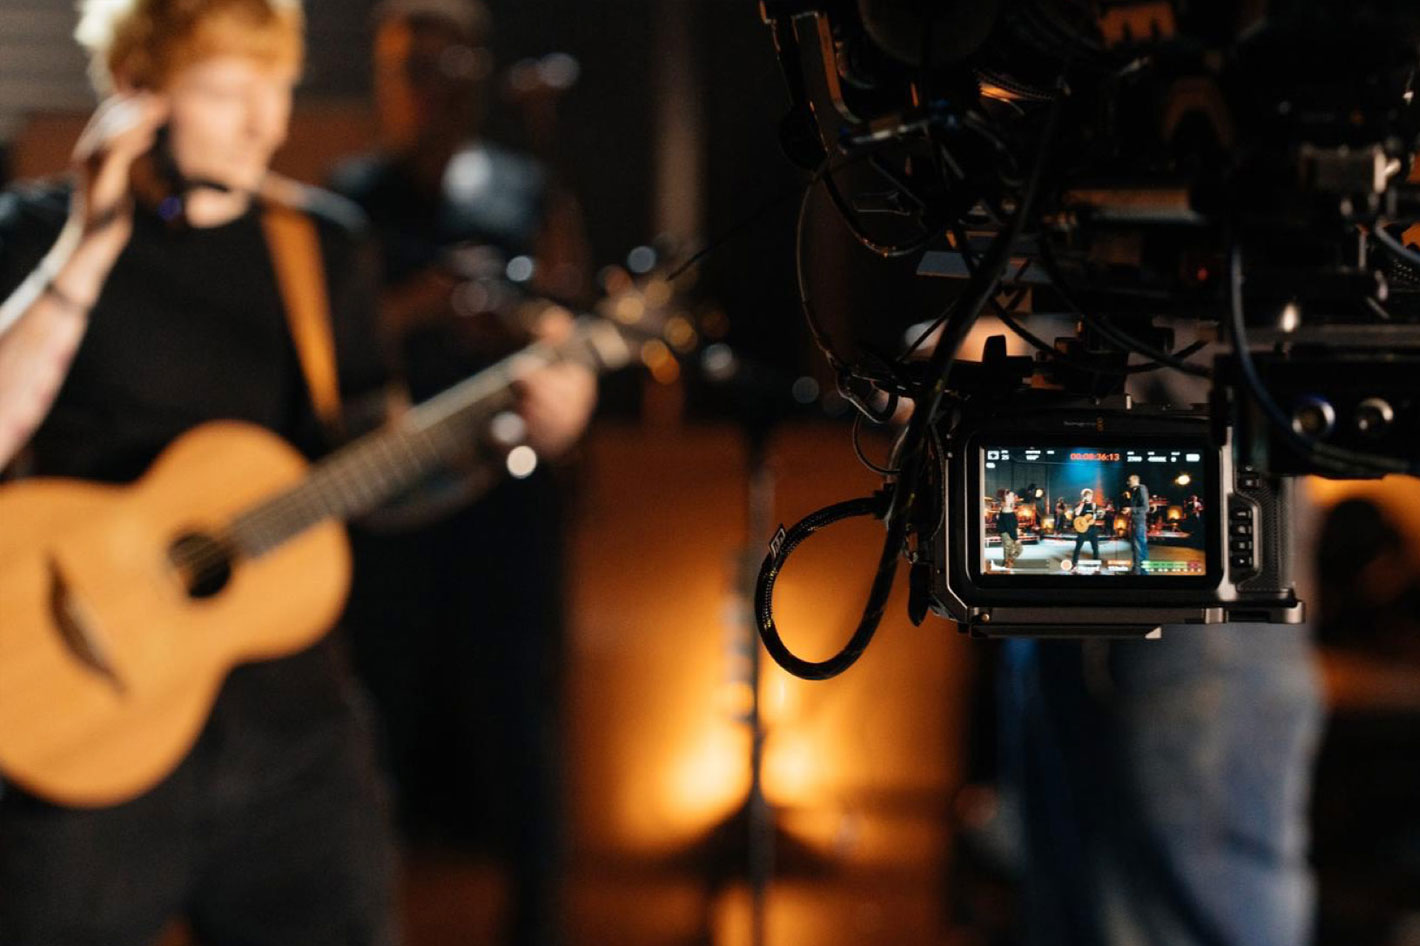 URSA Mini Pro 12K used to shoot Ed Sheeran's performance